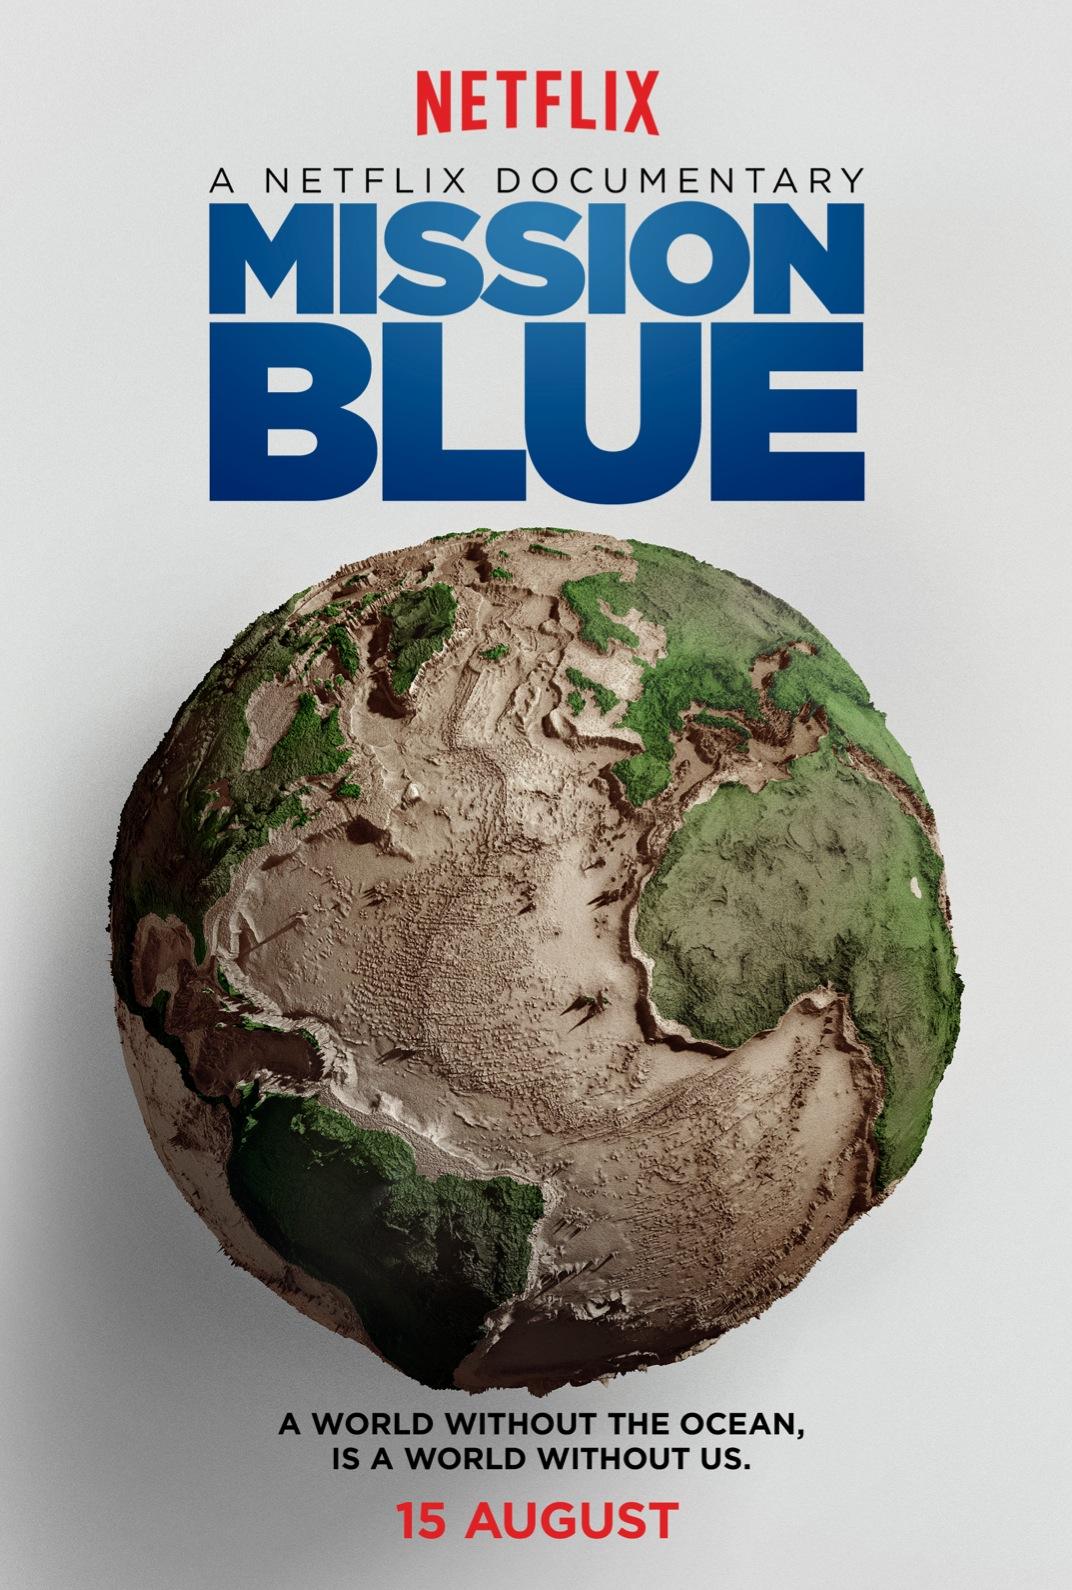 Mission Blue Netflix documentary